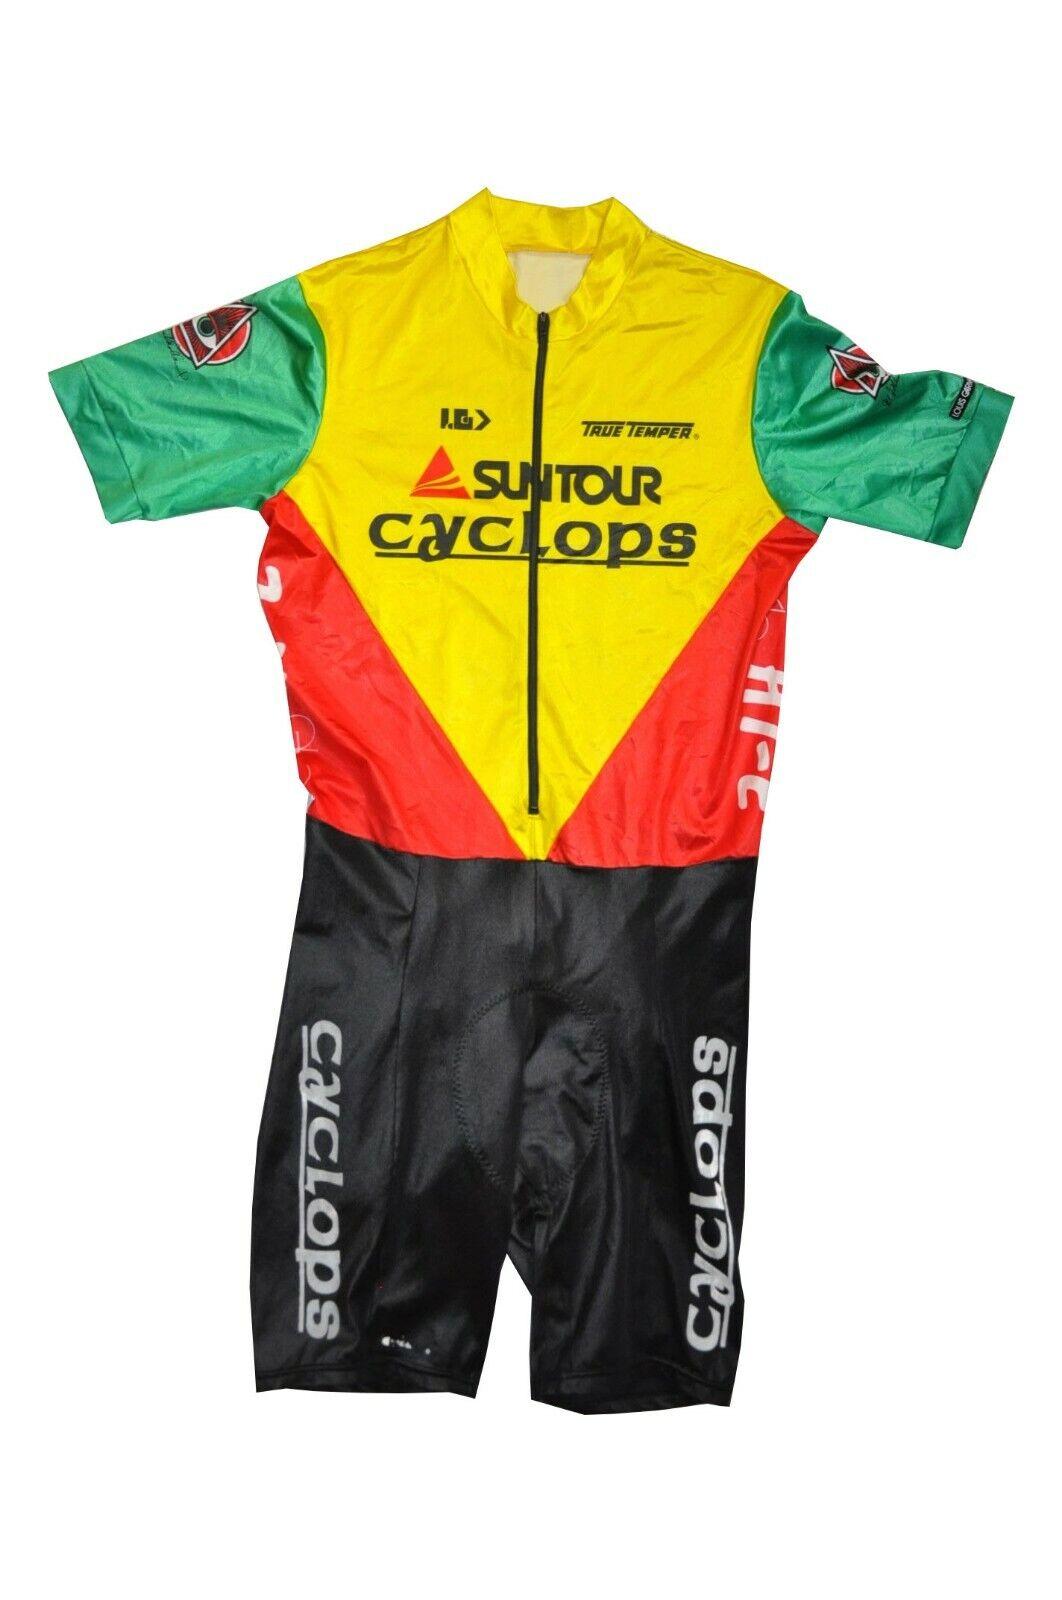 Louis Garneau vintage Race Suit Radanzug Gr. XL 5 Bike suntcyclops Anzug ES1